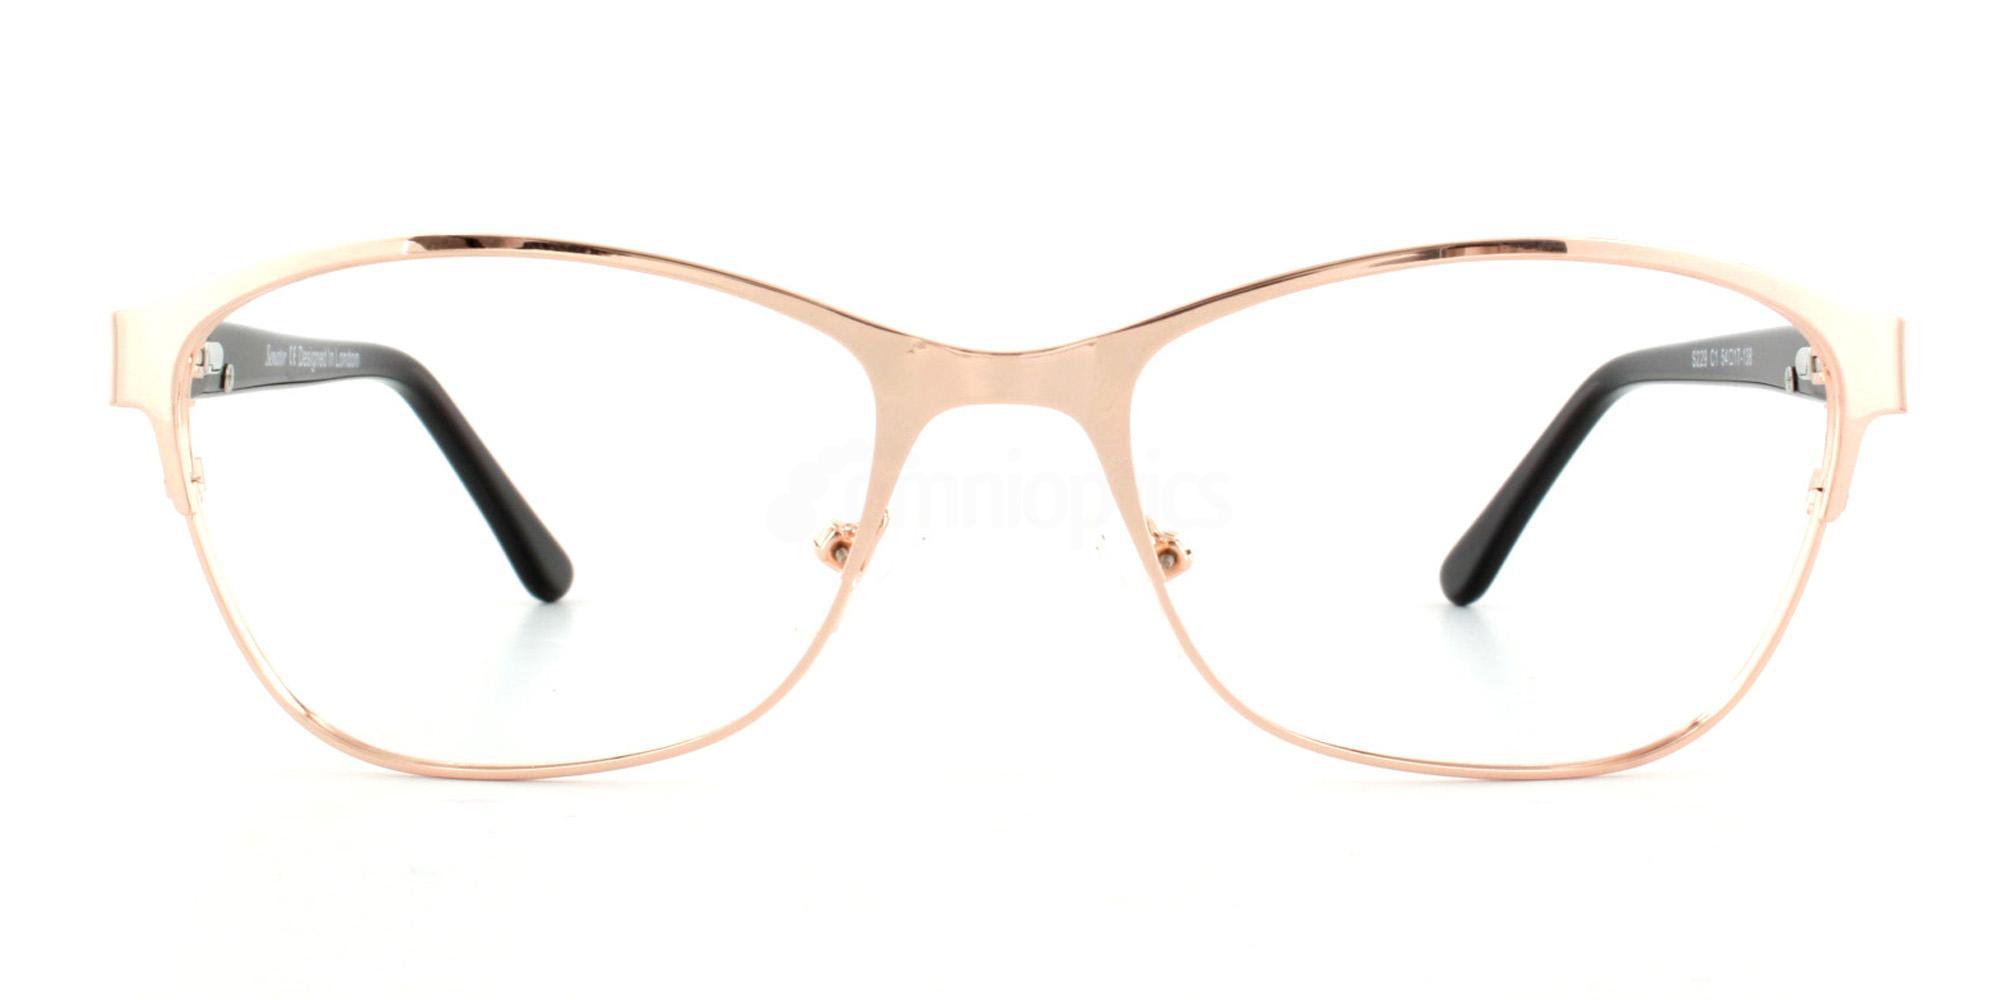 C1 SENATOR 229 Glasses, Senator